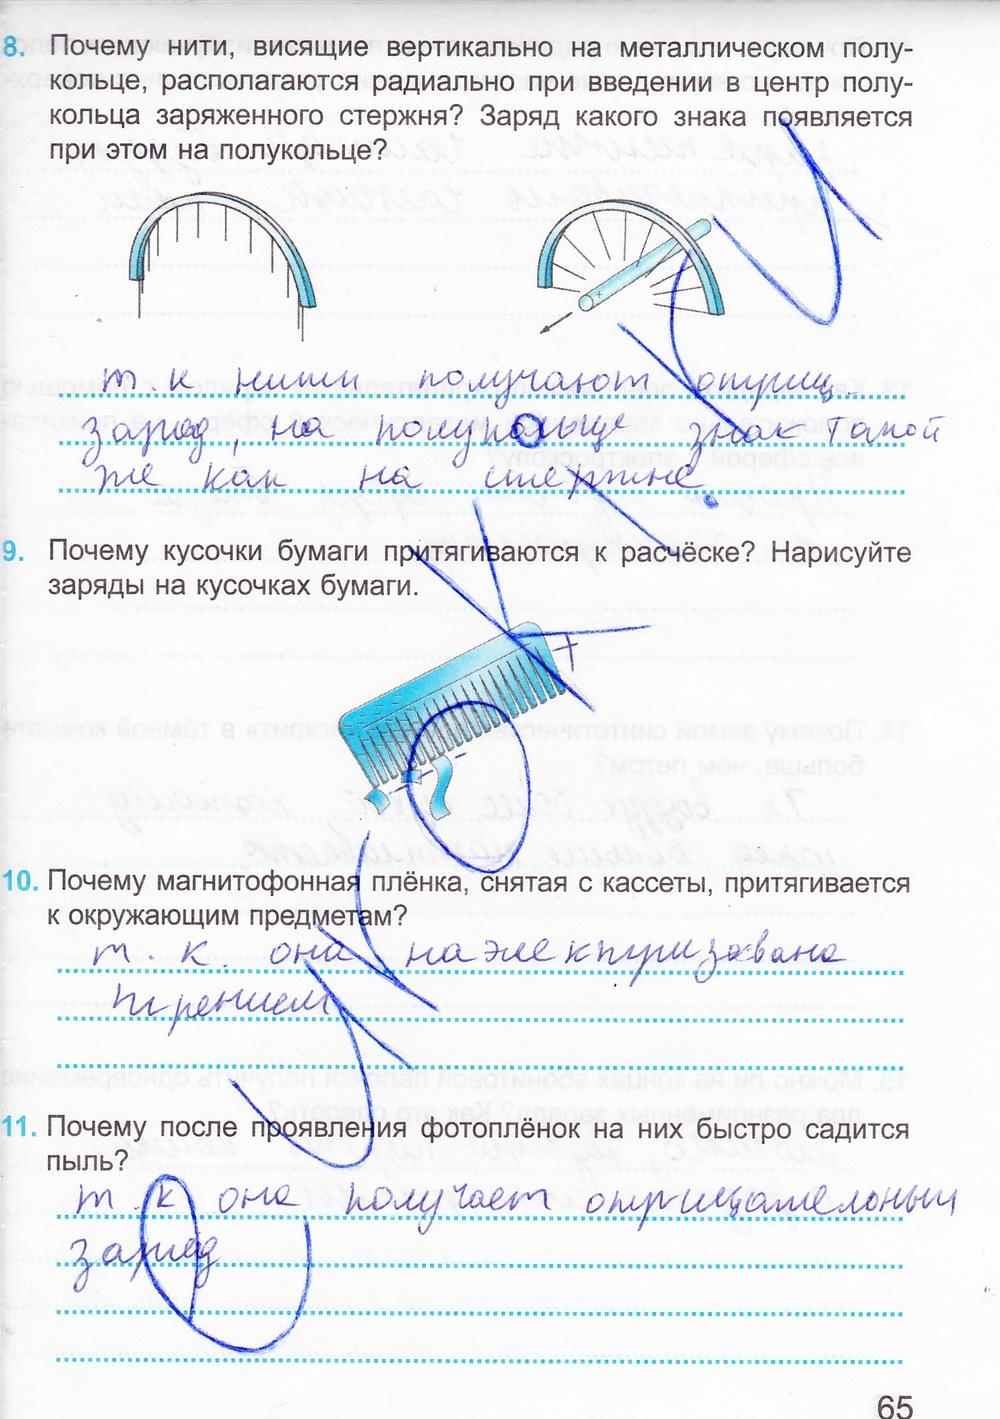 Издание физике гдз 15 по дмитриева